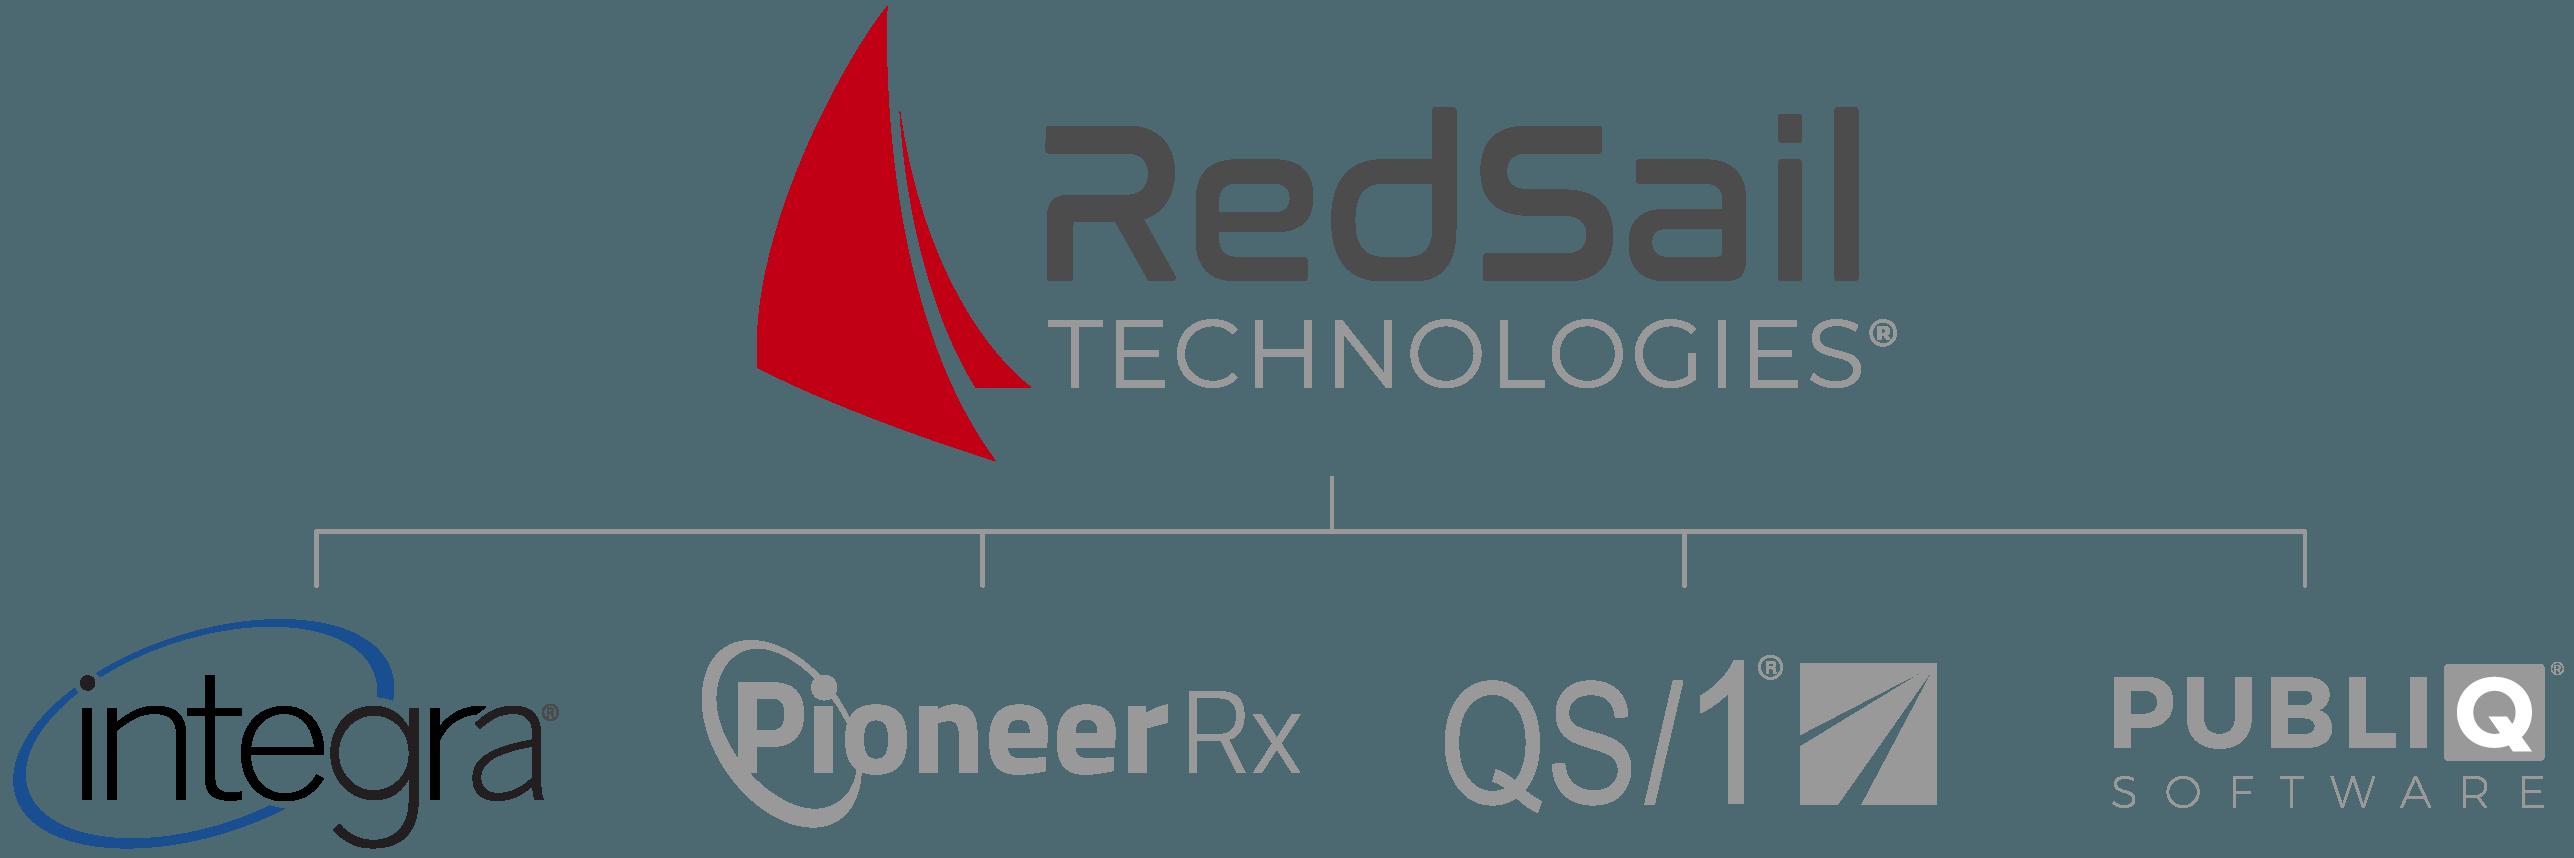 RedSail Brand Tree